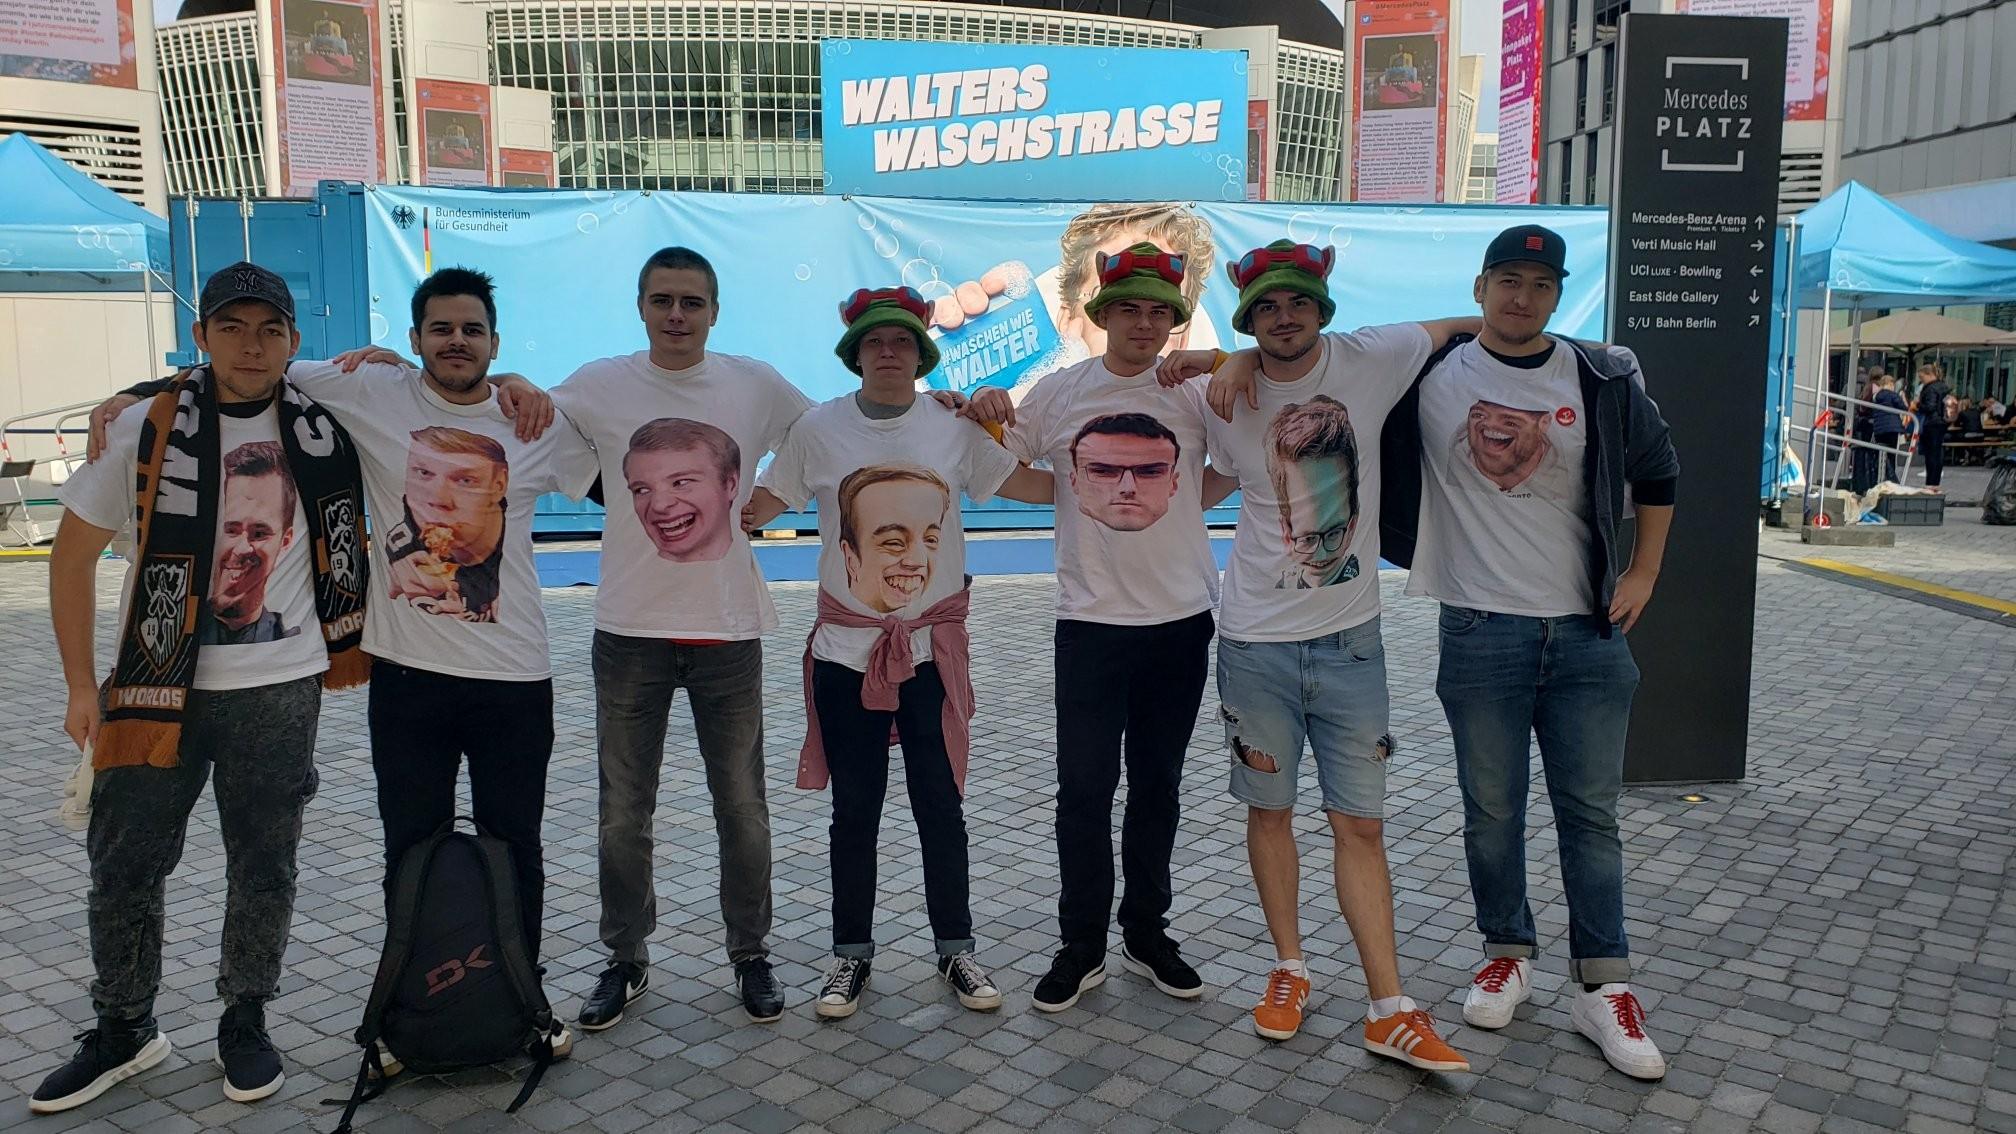 2019 World Championship G2 fans